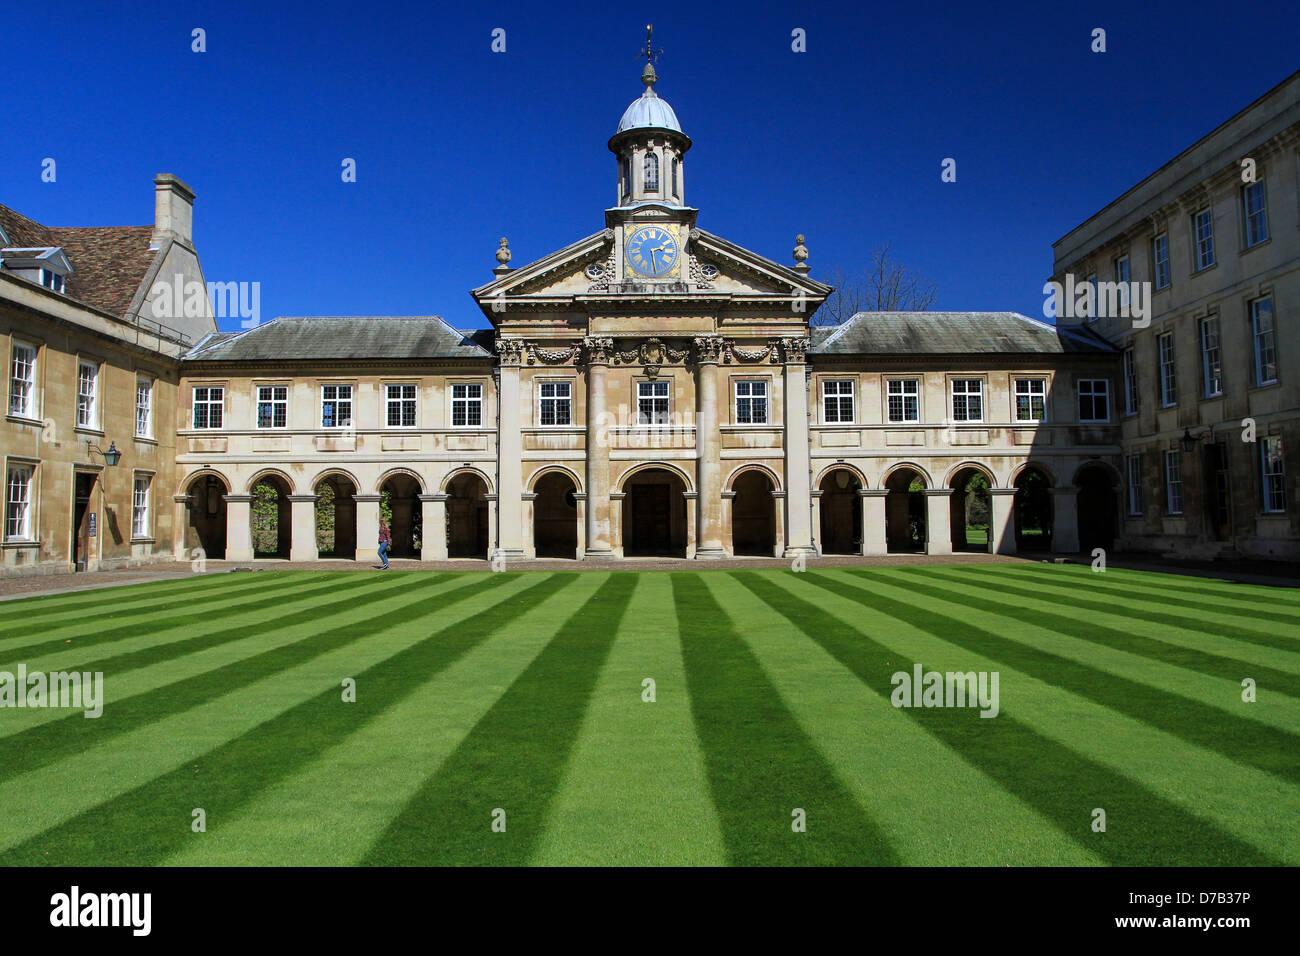 Emmanuel College Grounds - Stock Image